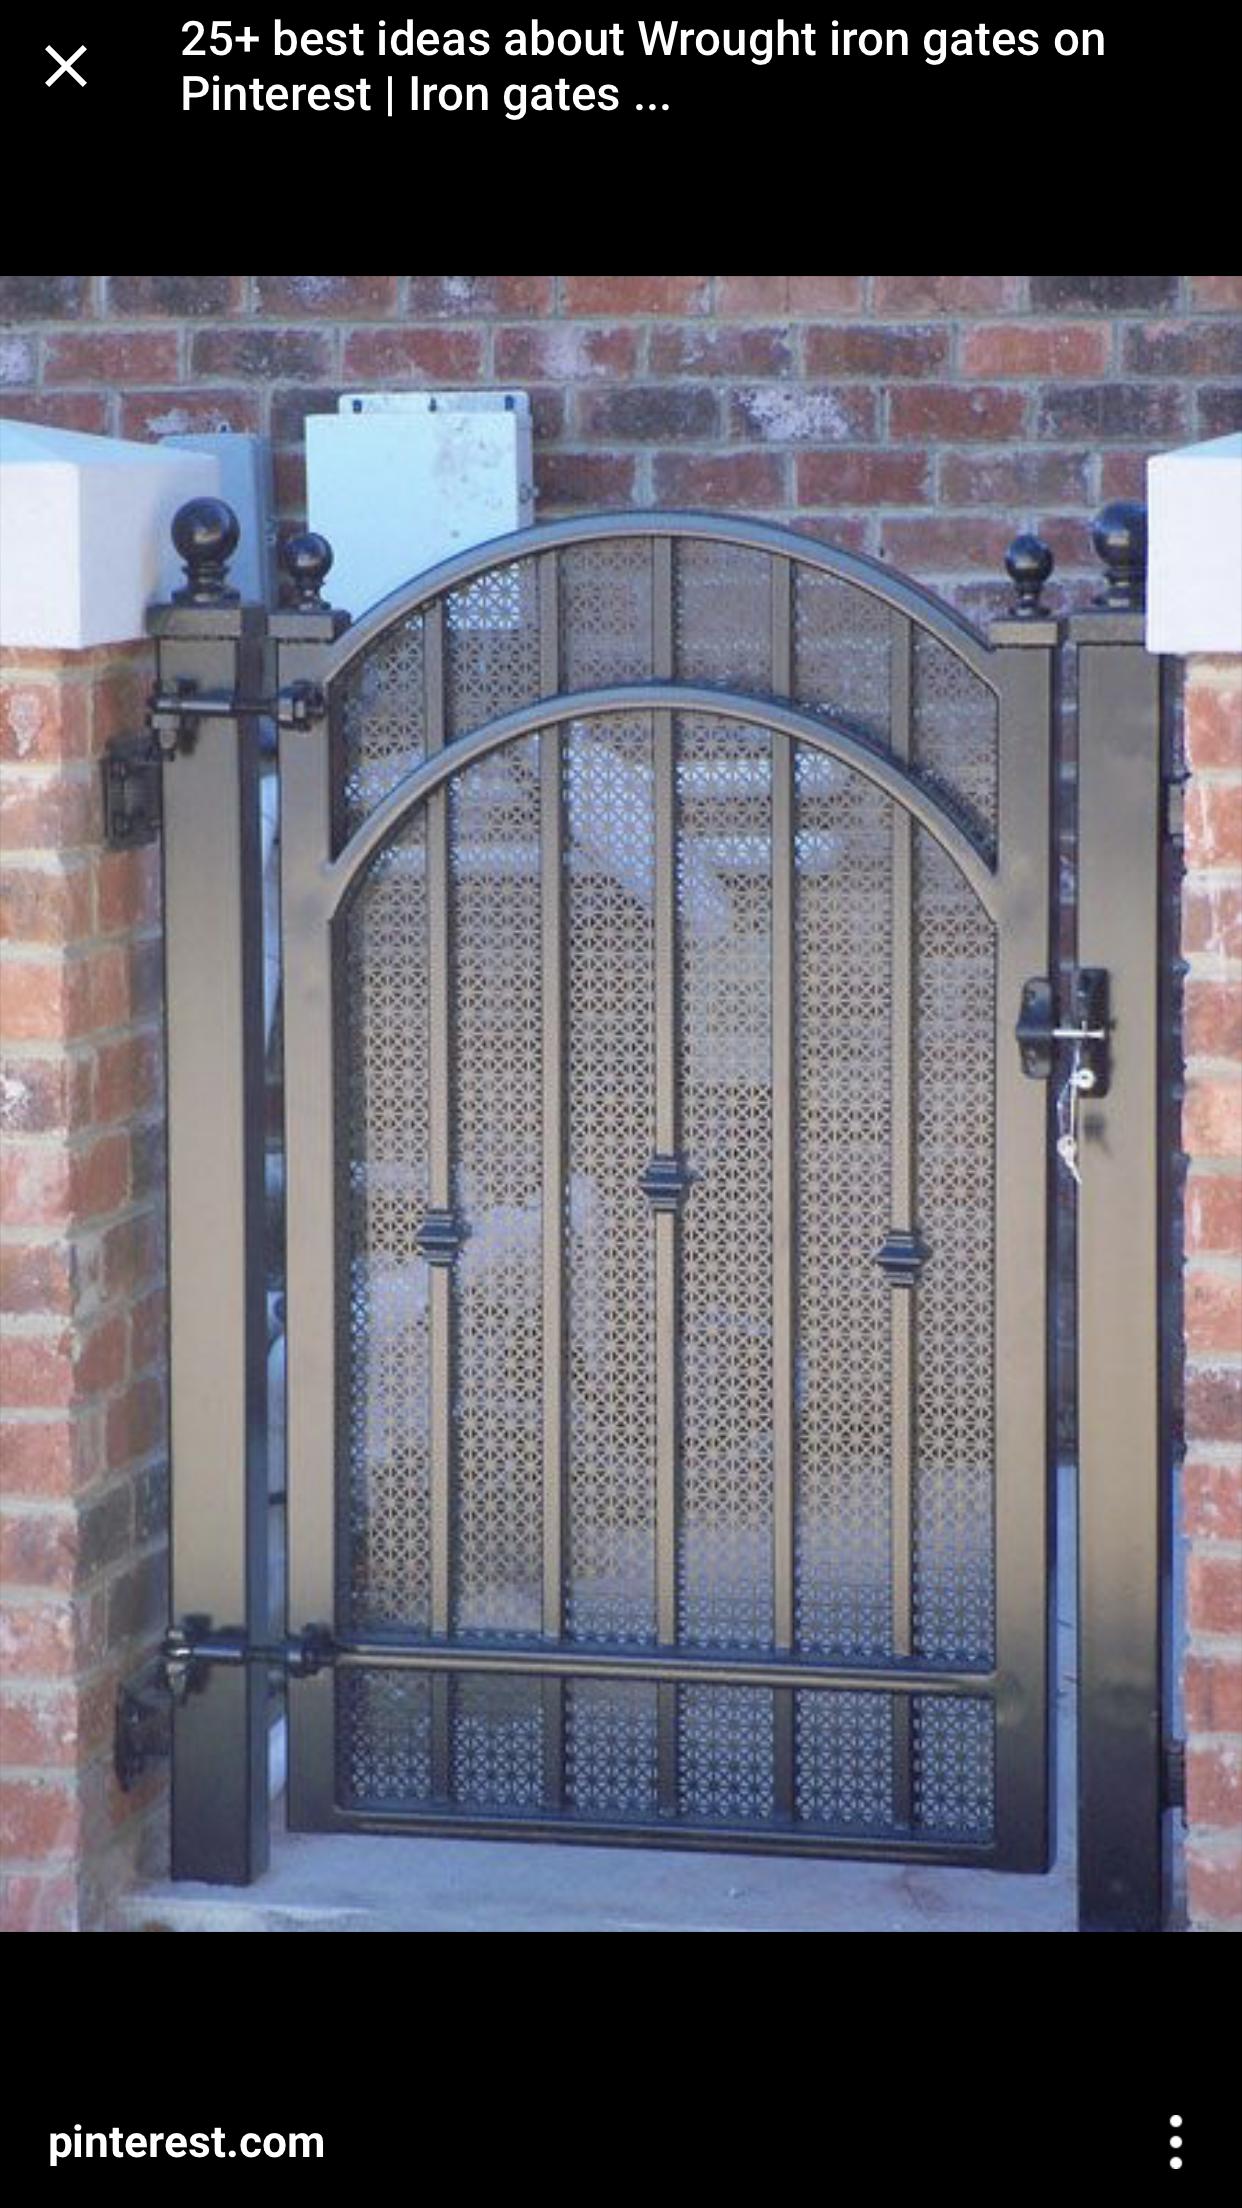 Pin By Lili Gutierrez On Front Yard Landscape Iron Gate Design